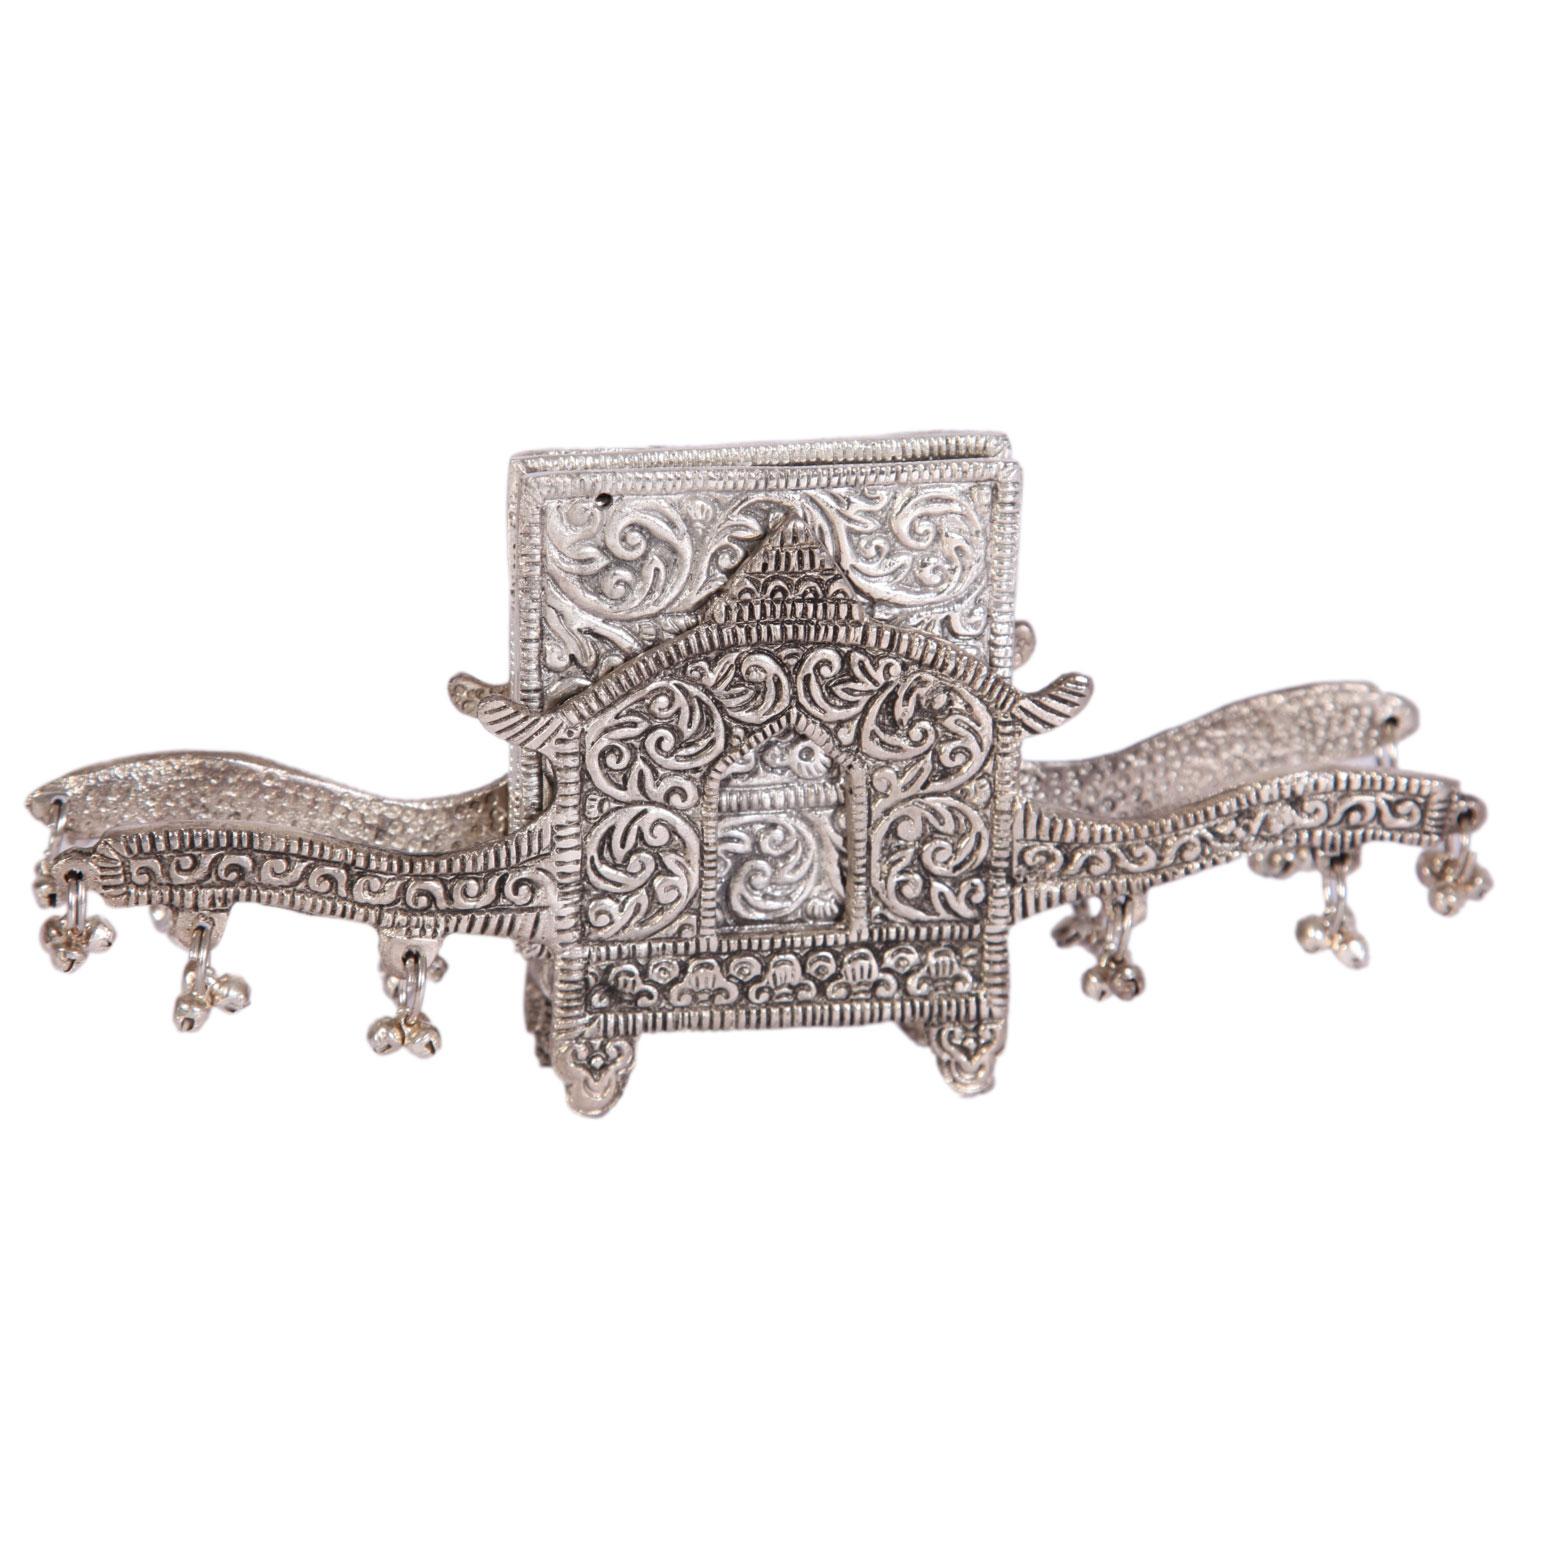 Oxidized Decorated Handmade Doli Shaped Tea Coaster